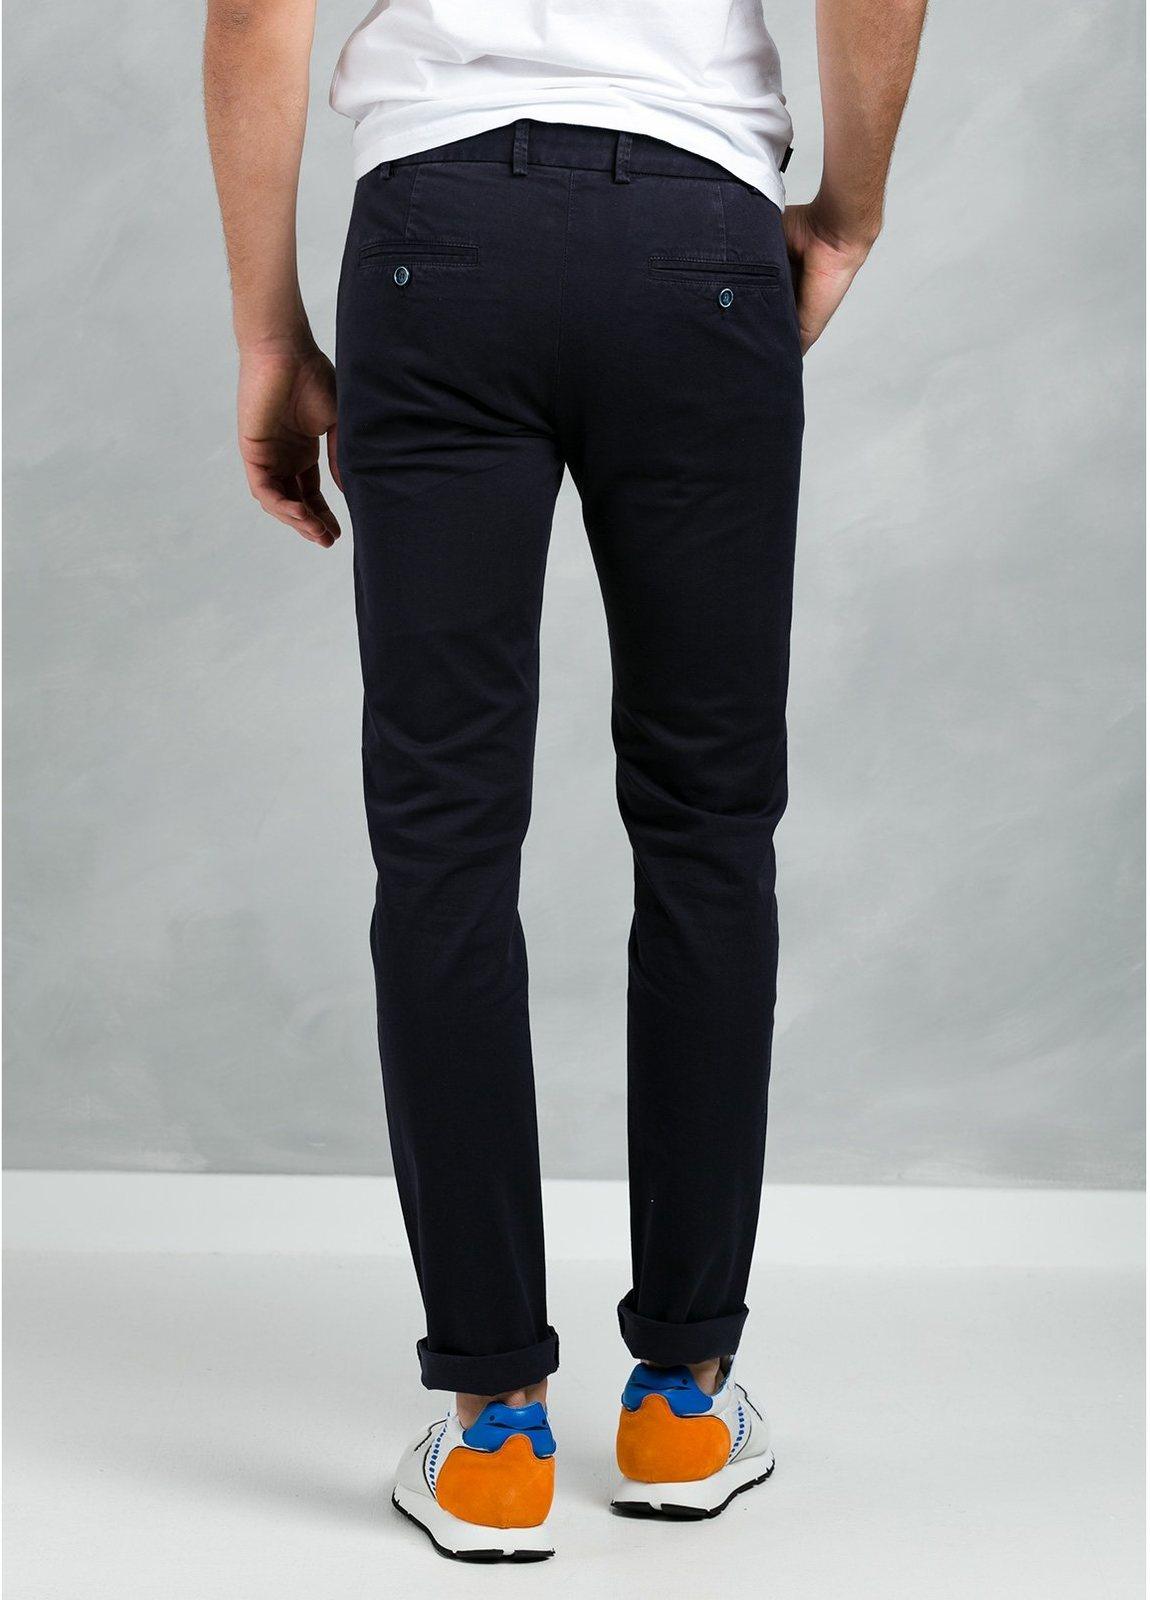 Pantalón Casual Wear, SLIM FIT micro textura color azul marino, 97% Algodón 3% Elastómero. - Ítem3